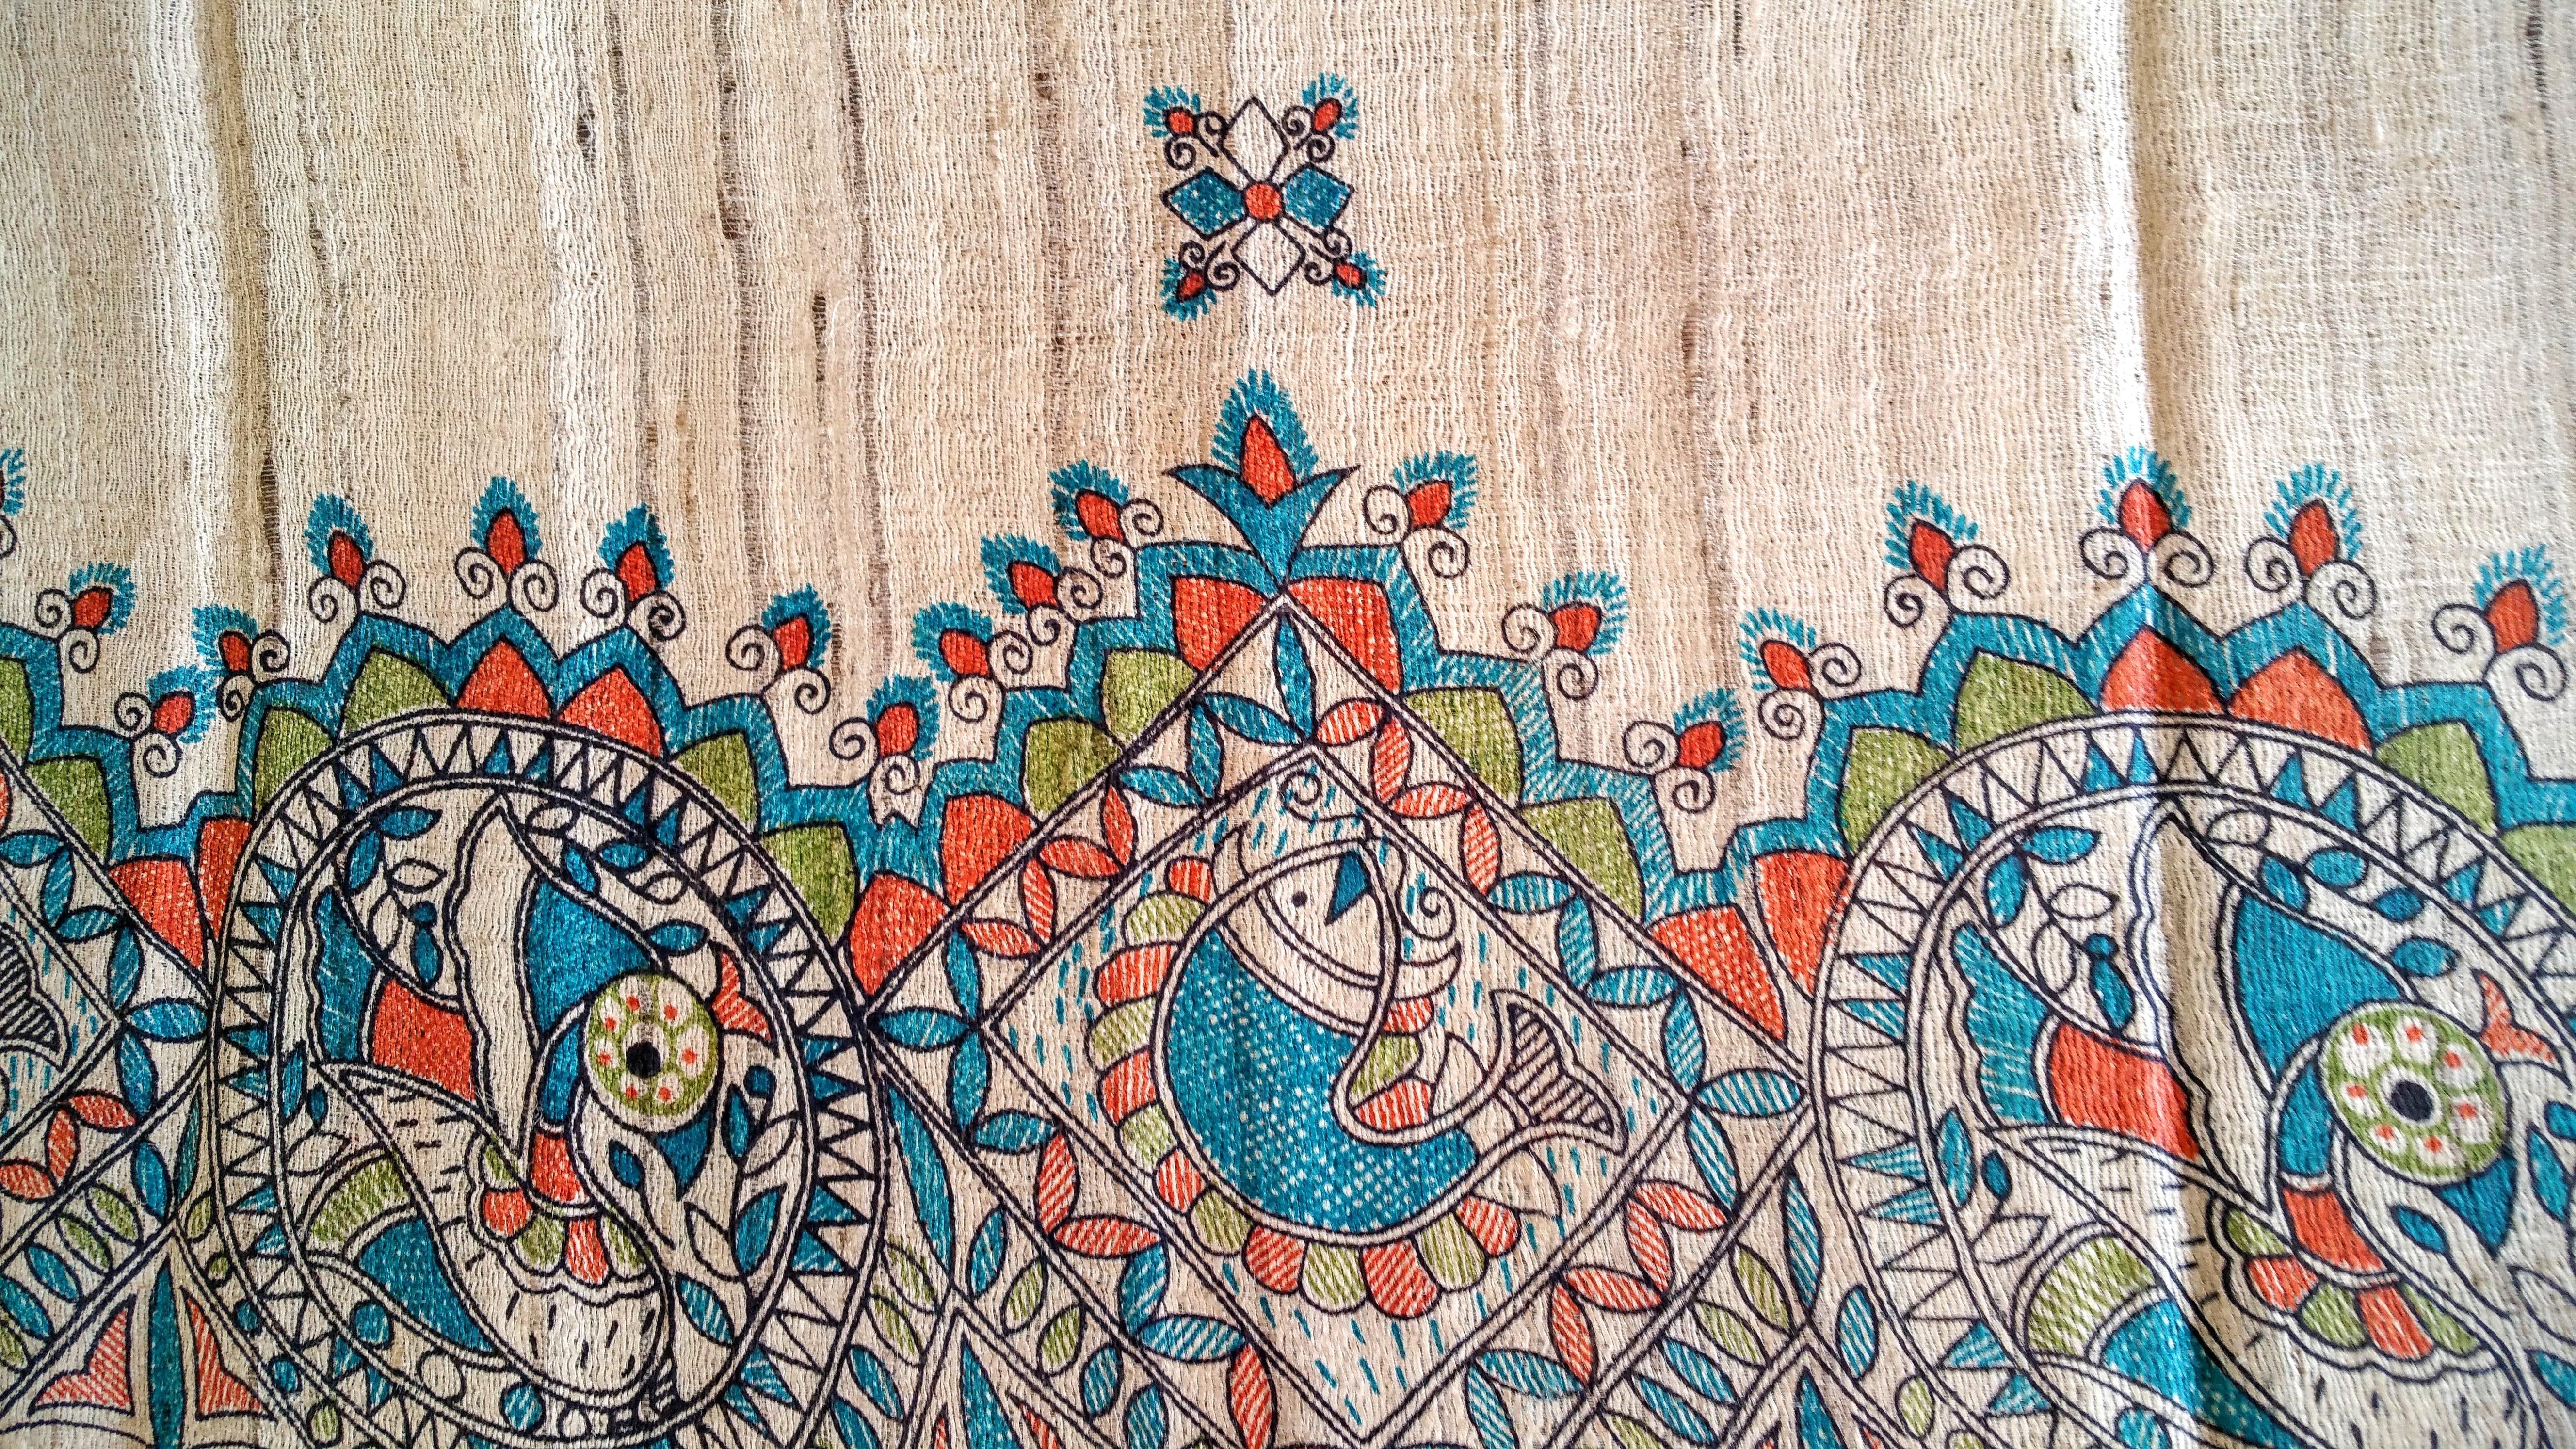 Fotos gratis : flor, naranja, patrón, verde, marrón, azul, pescado ...